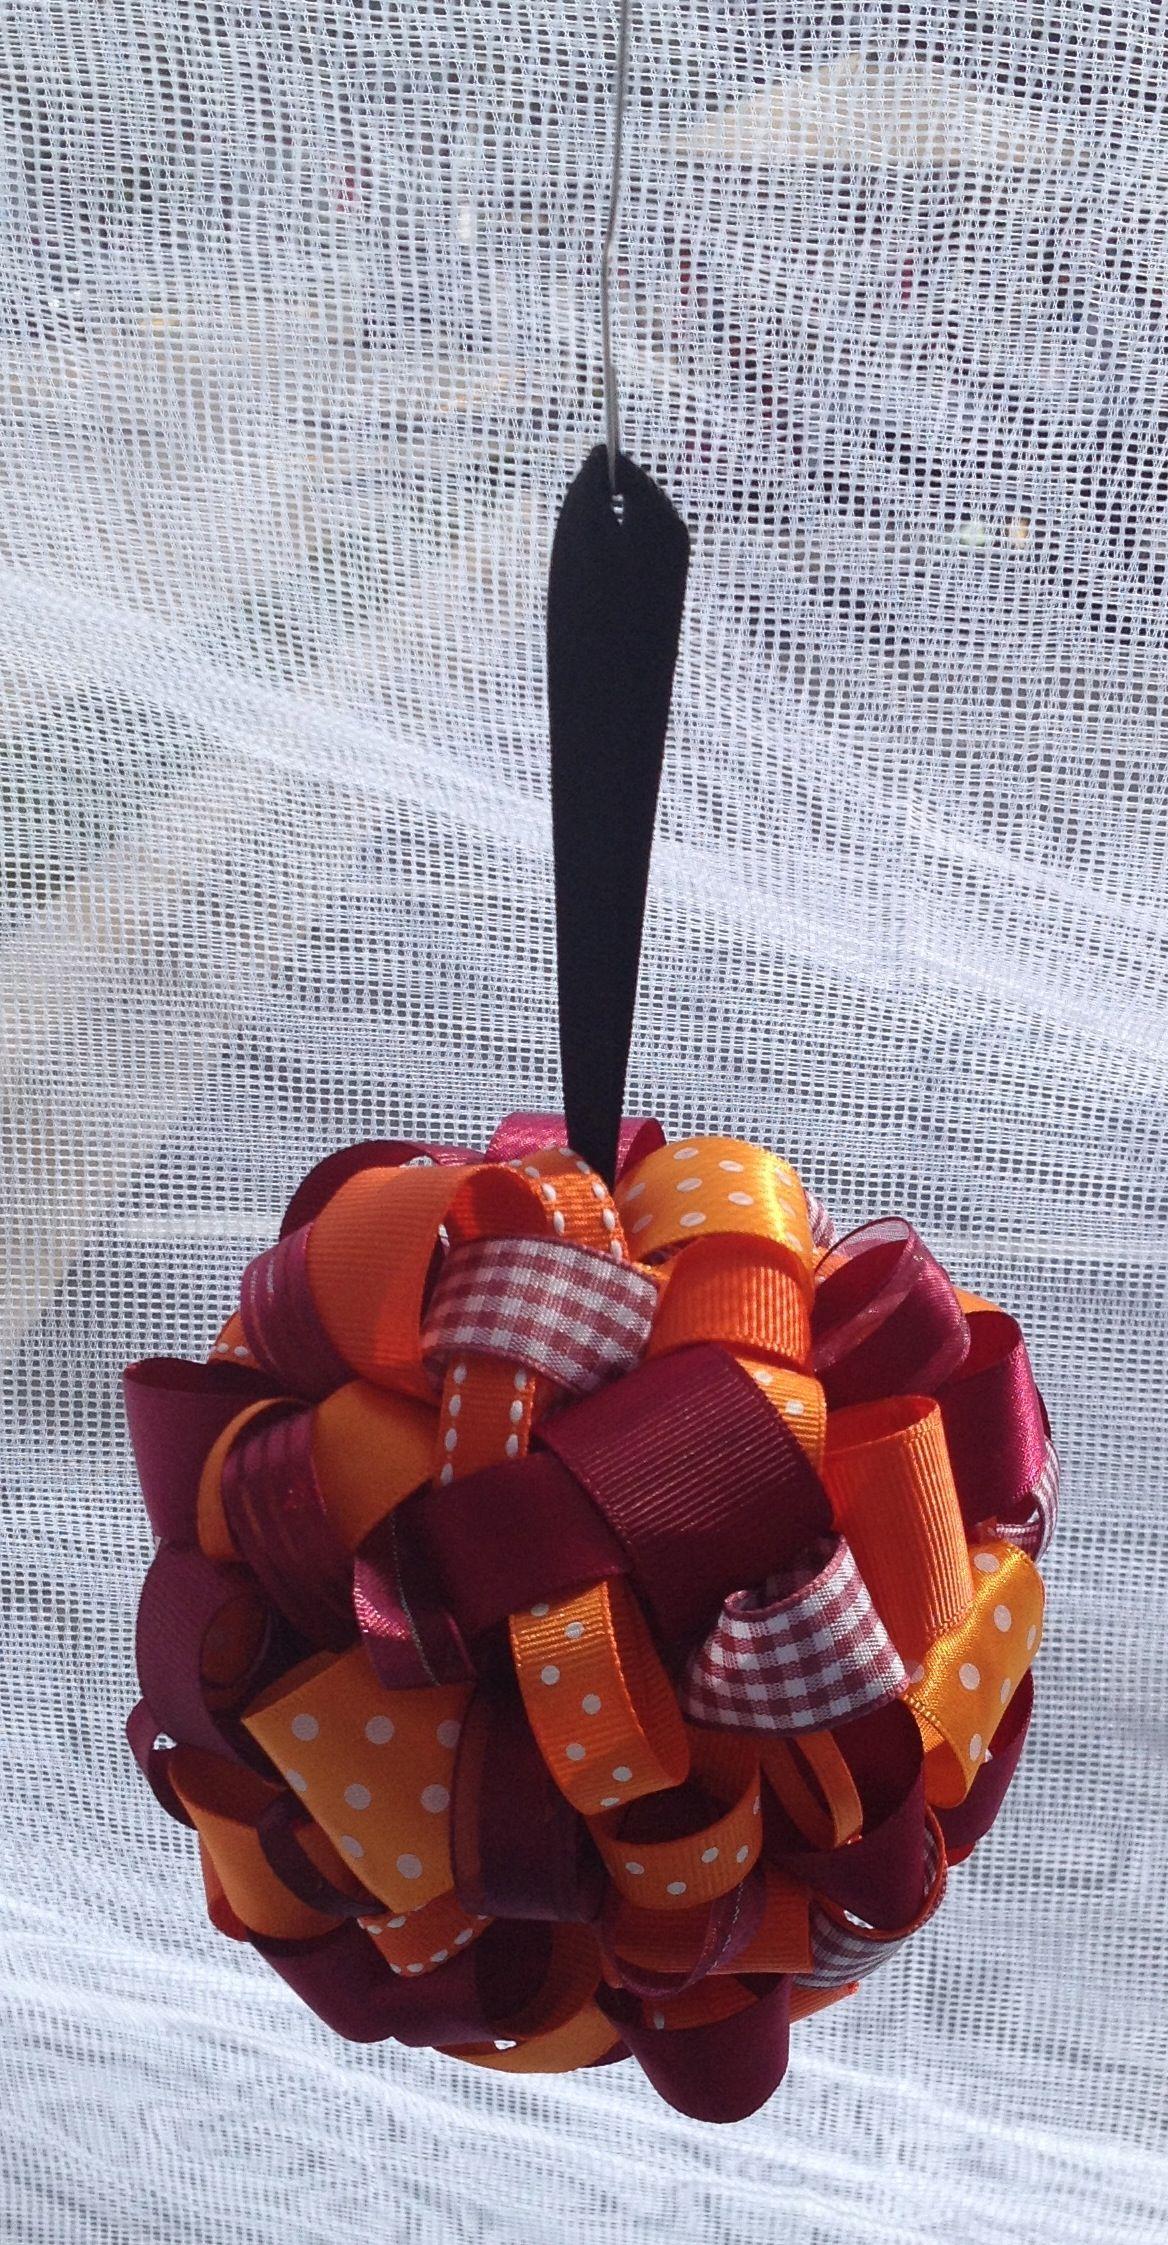 Hokie Style!!! Orange and Maroon Ribbon Topiarystyle